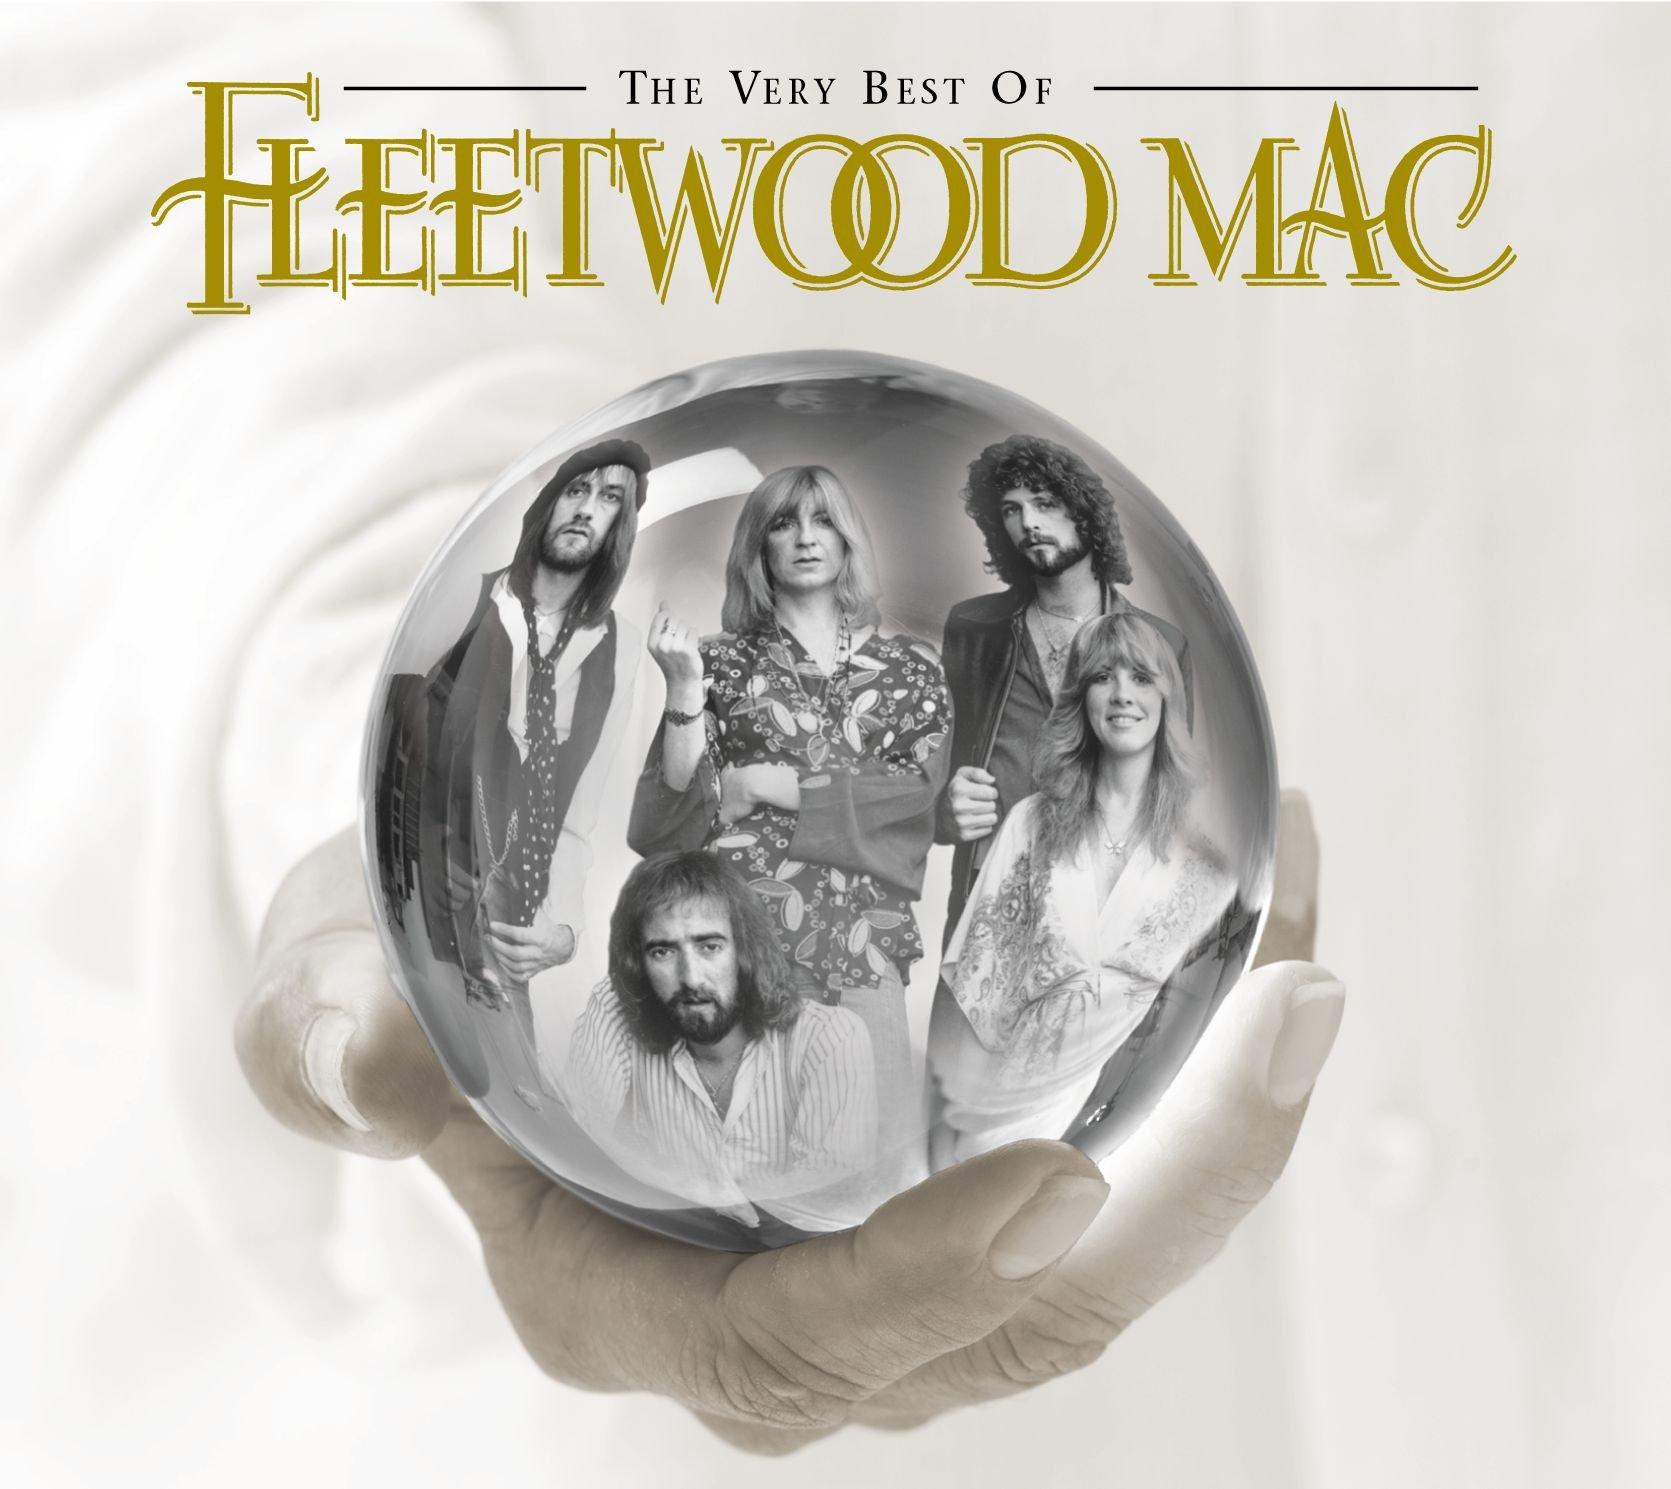 The Very Best Of Fleetwood Mac (2CD) by FLEETWOOD MAC